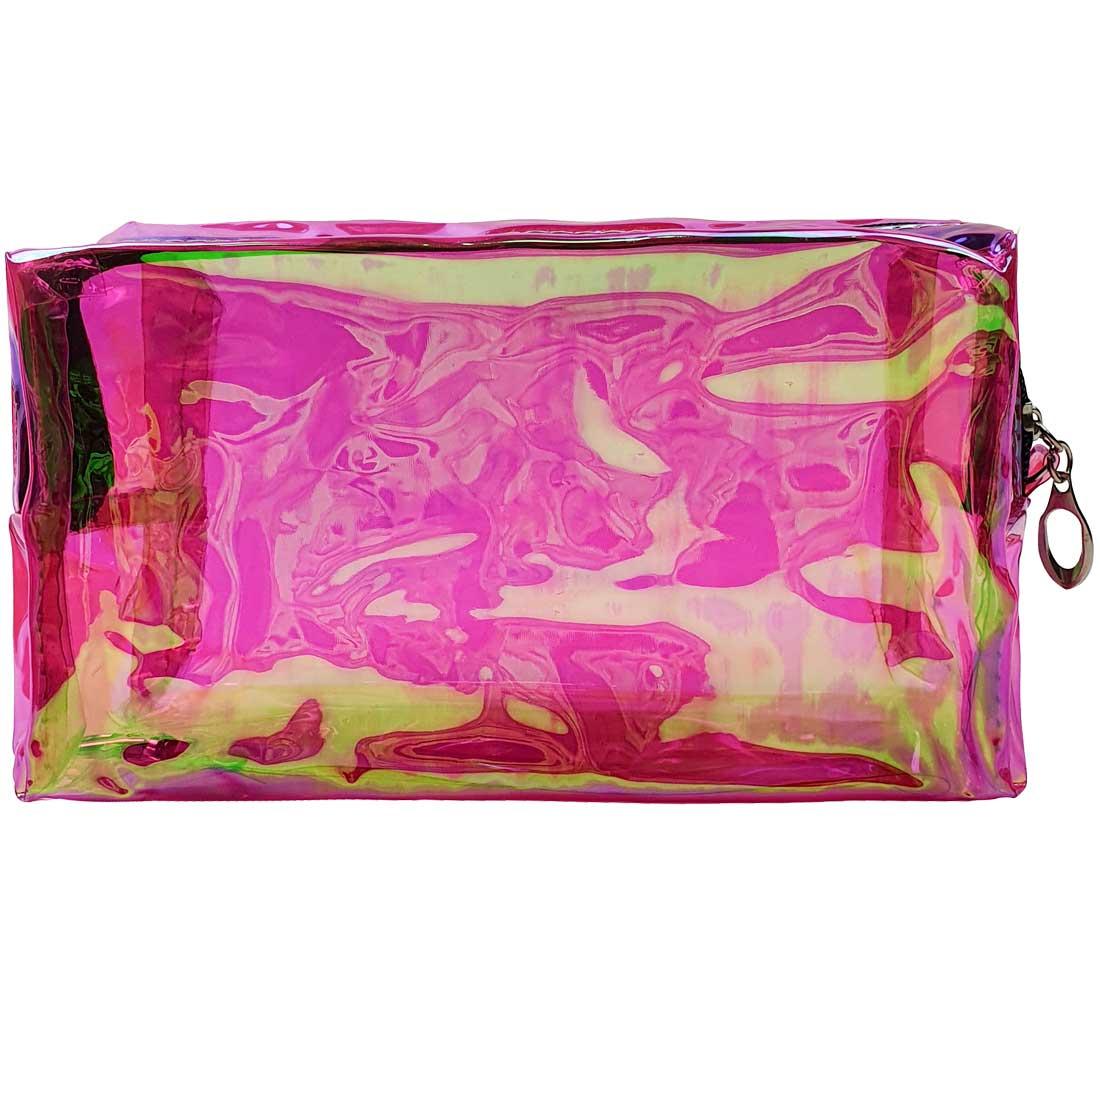 Necessaire Holográfica Translúcida - Pink